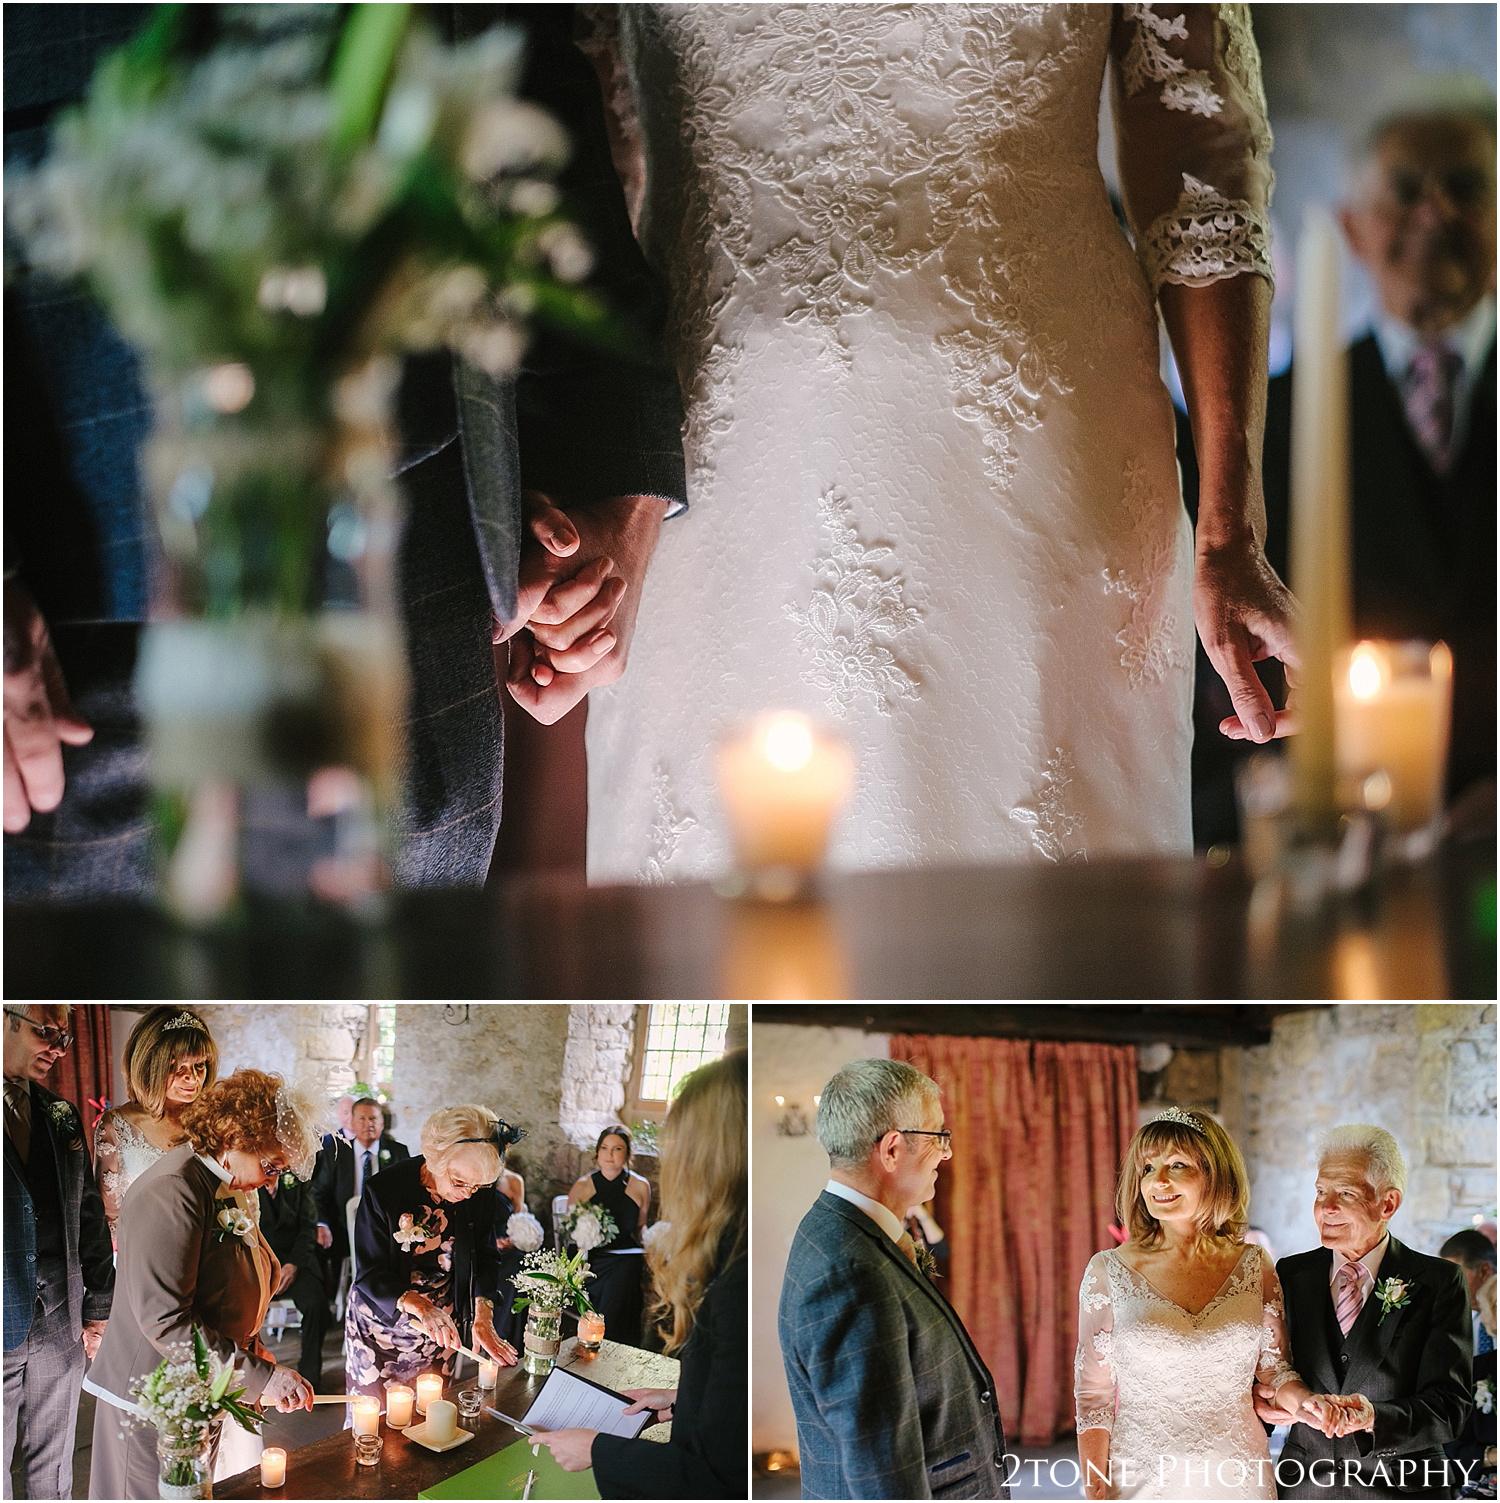 Crook Hall wedding photographer 012.jpg